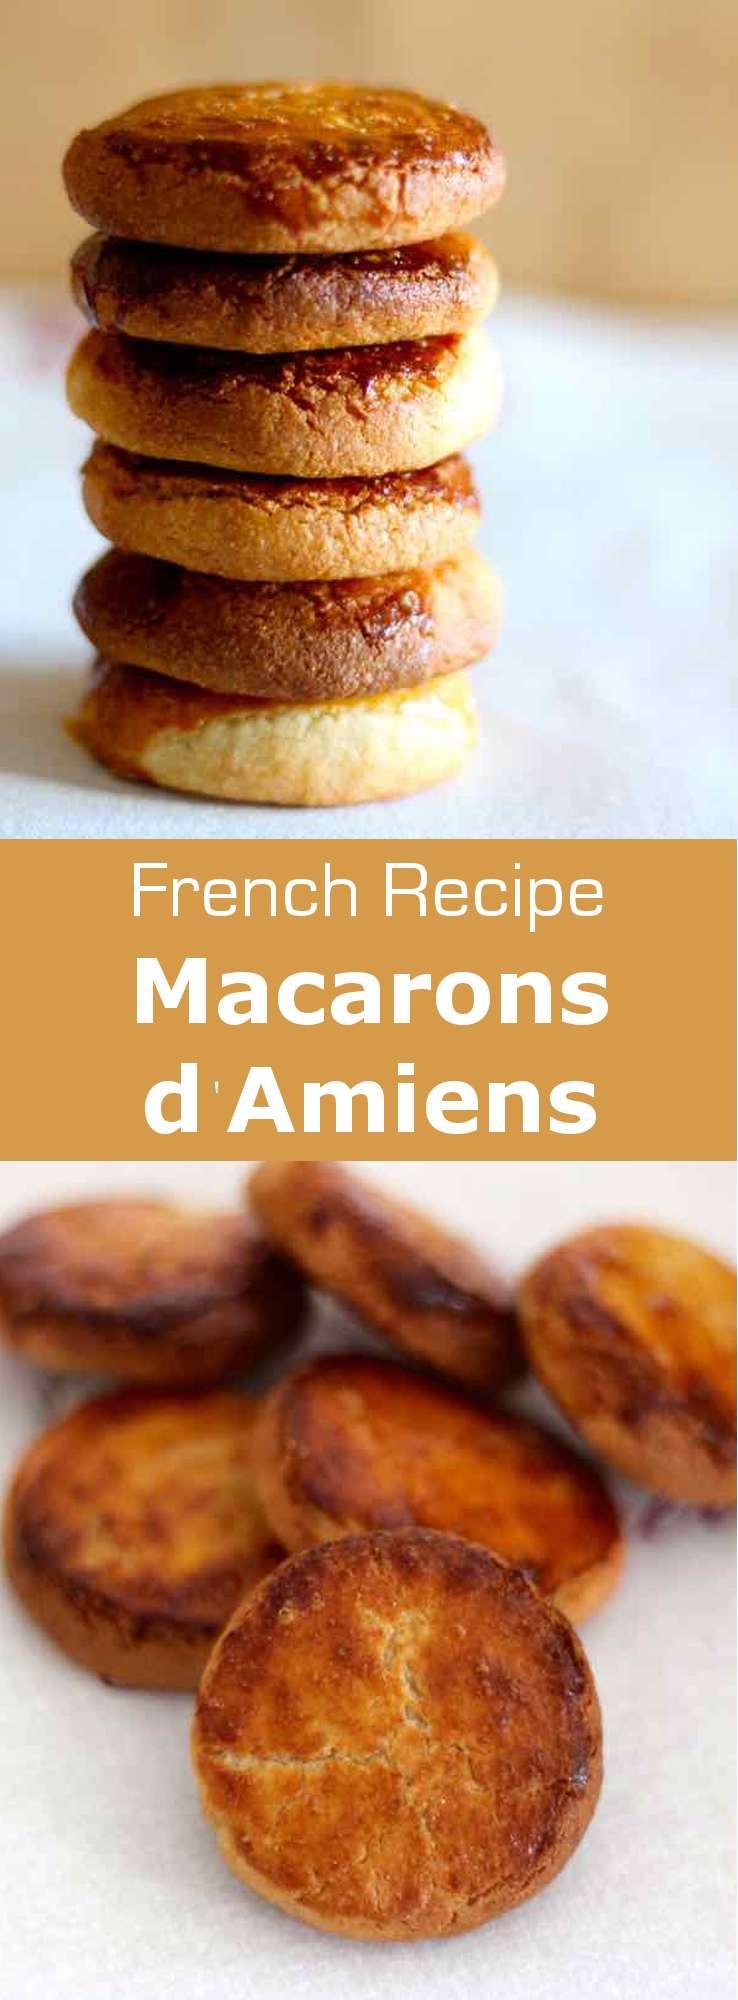 Amiens Macarons - Original French Recipe | 196 flavors